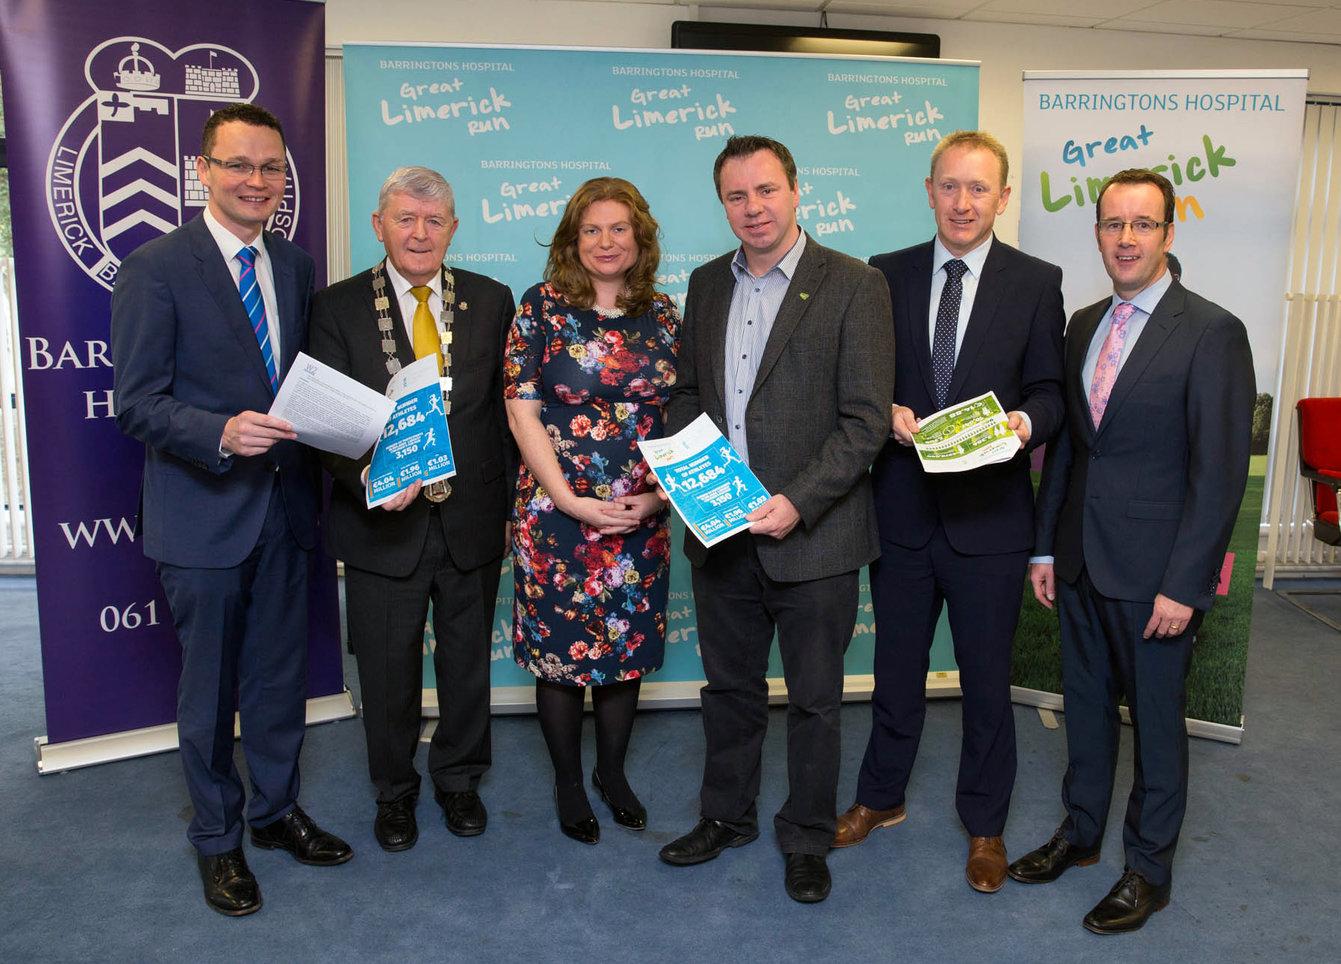 Great Limerick Run generates 4 million euro